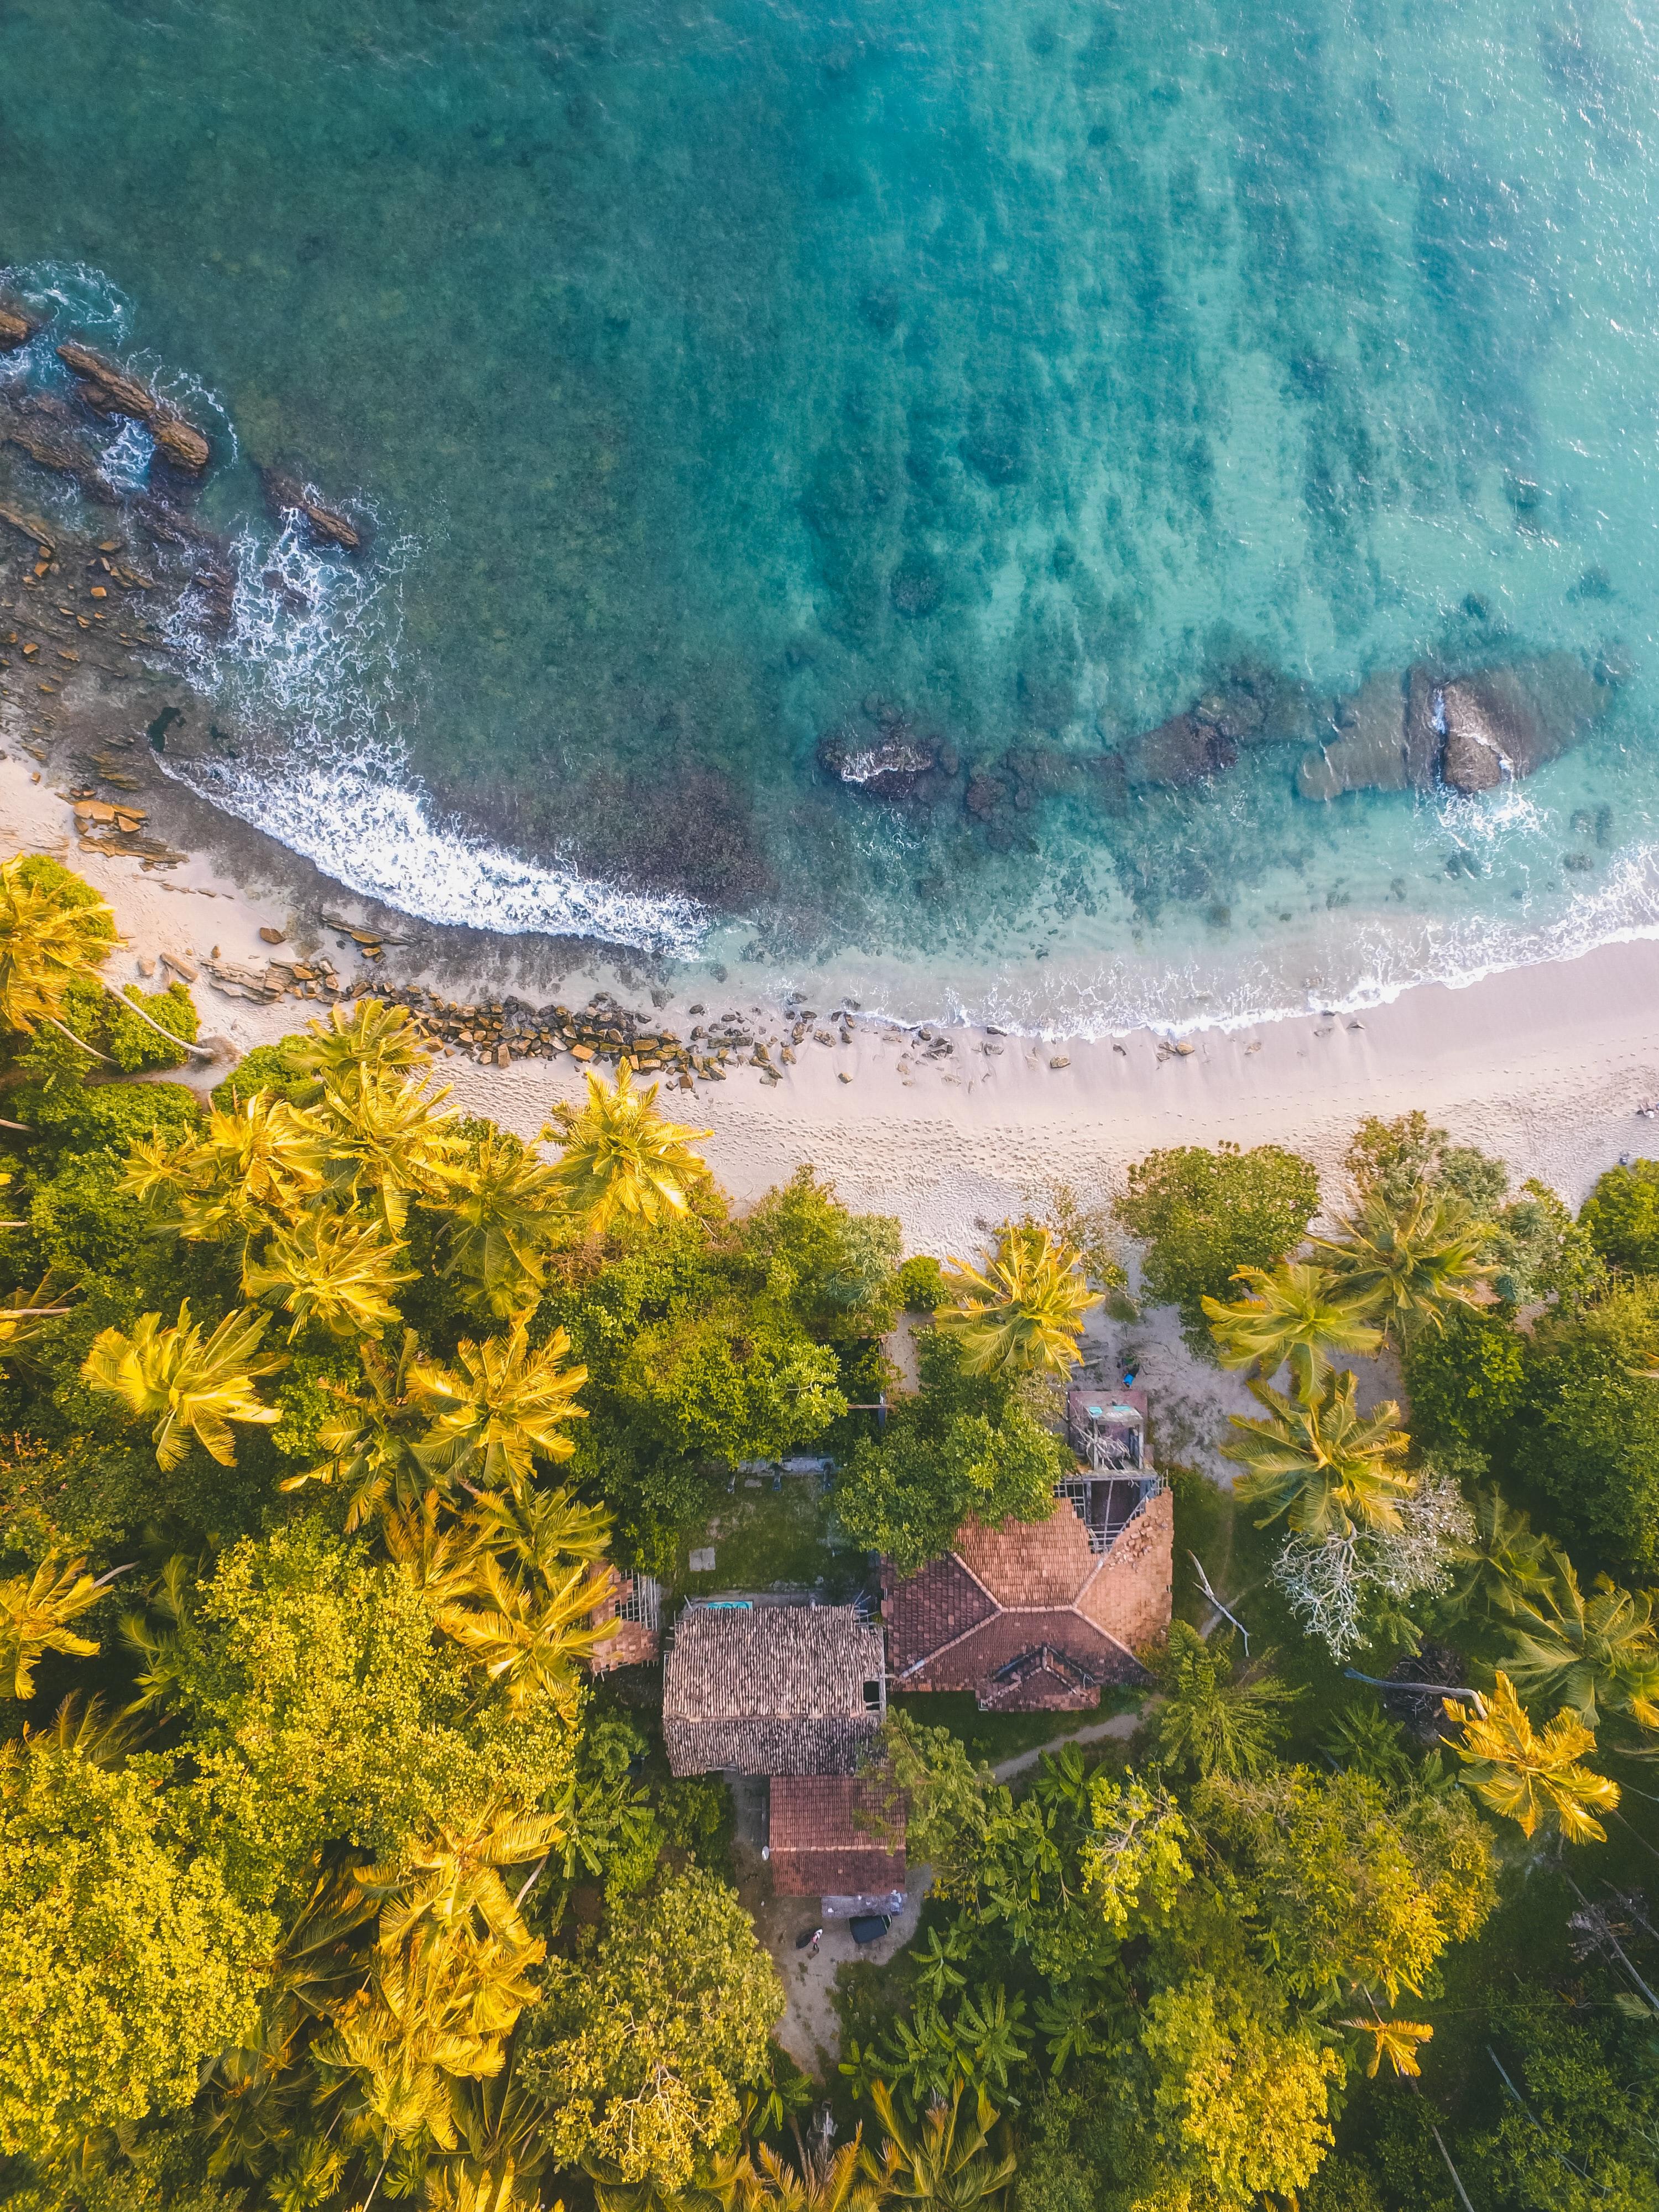 Aerial view of Sri Lankan coast